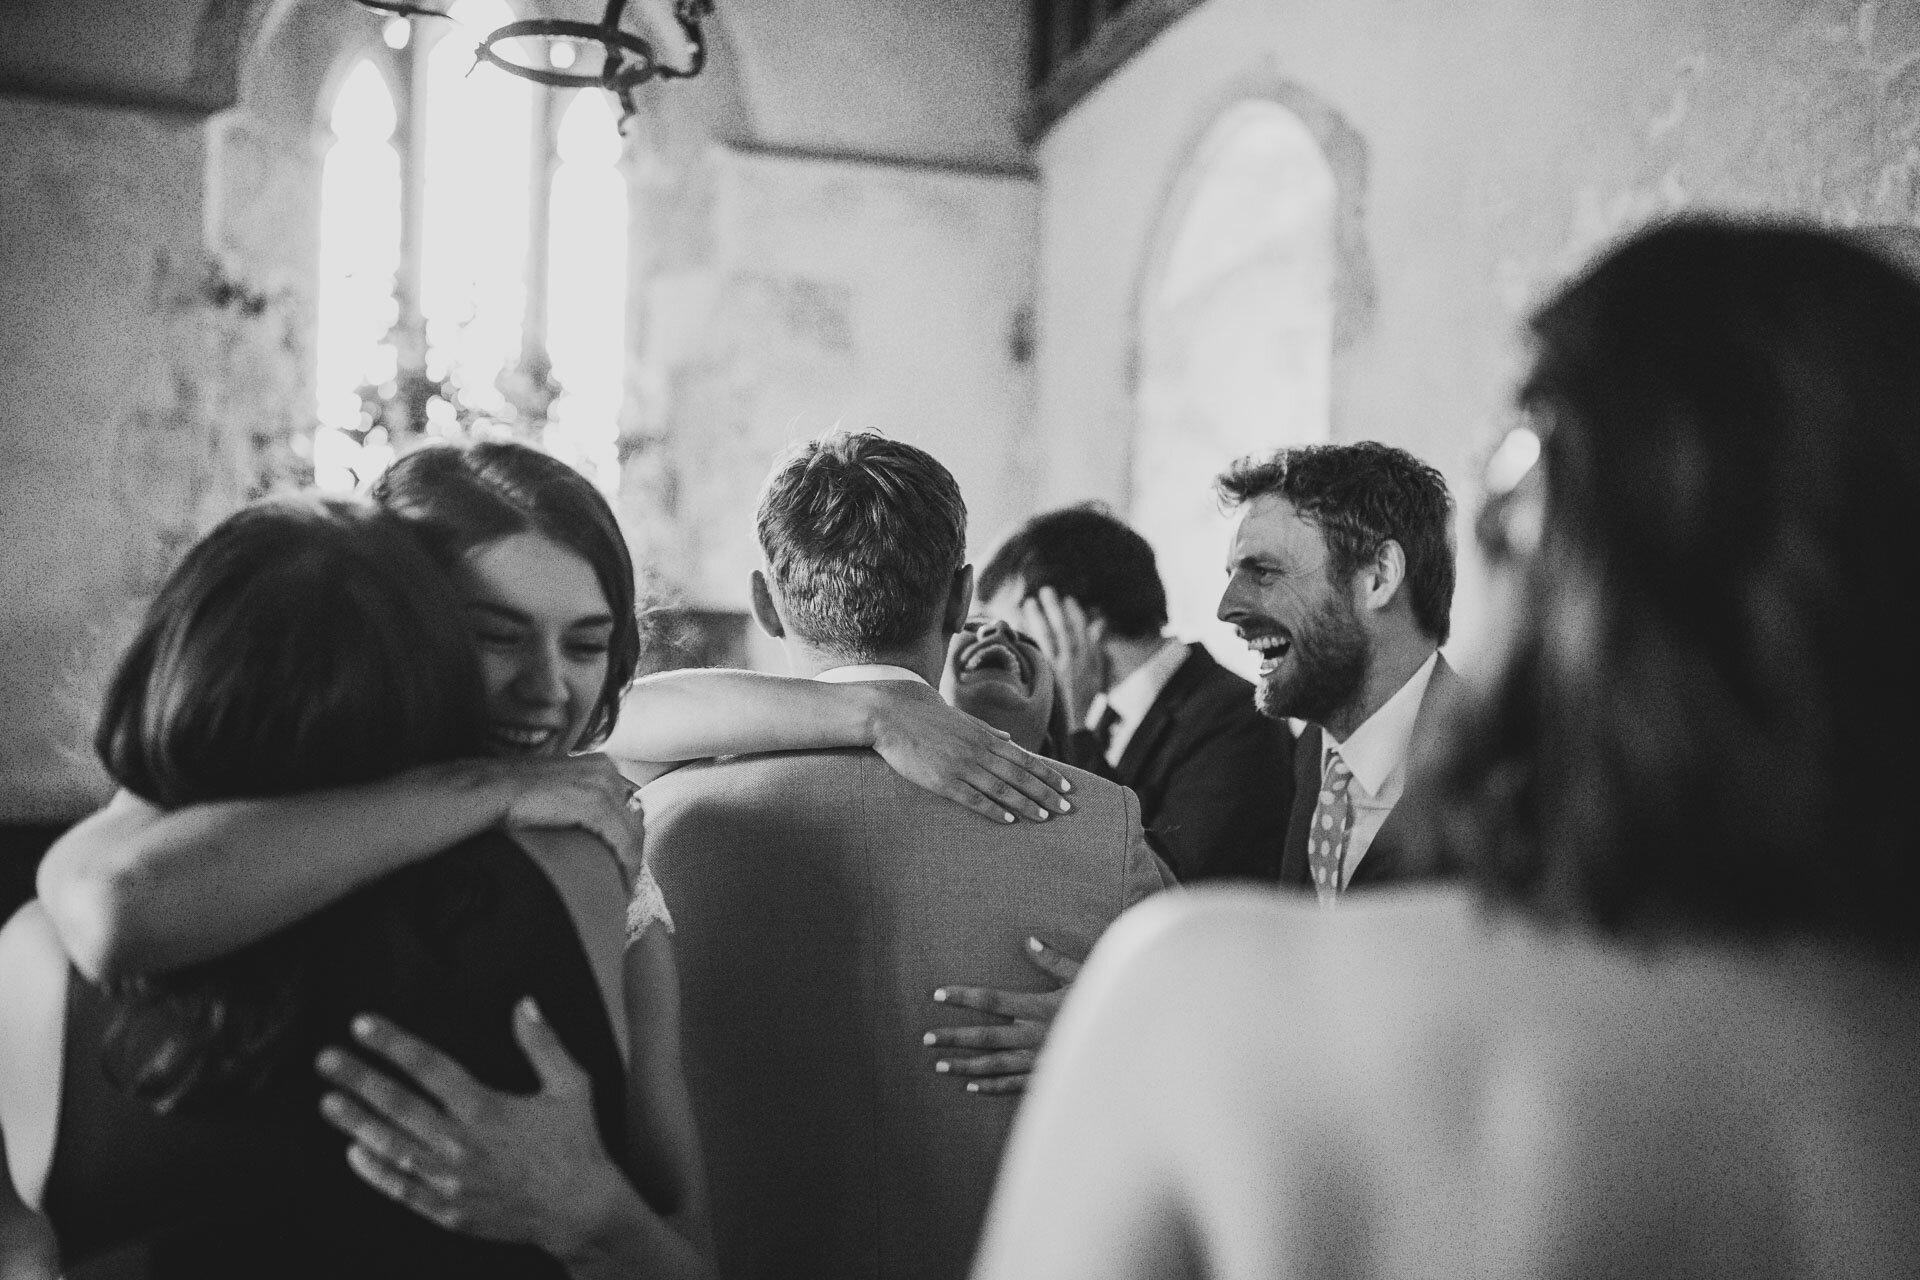 dorset_wedding_photographer-56.jpg